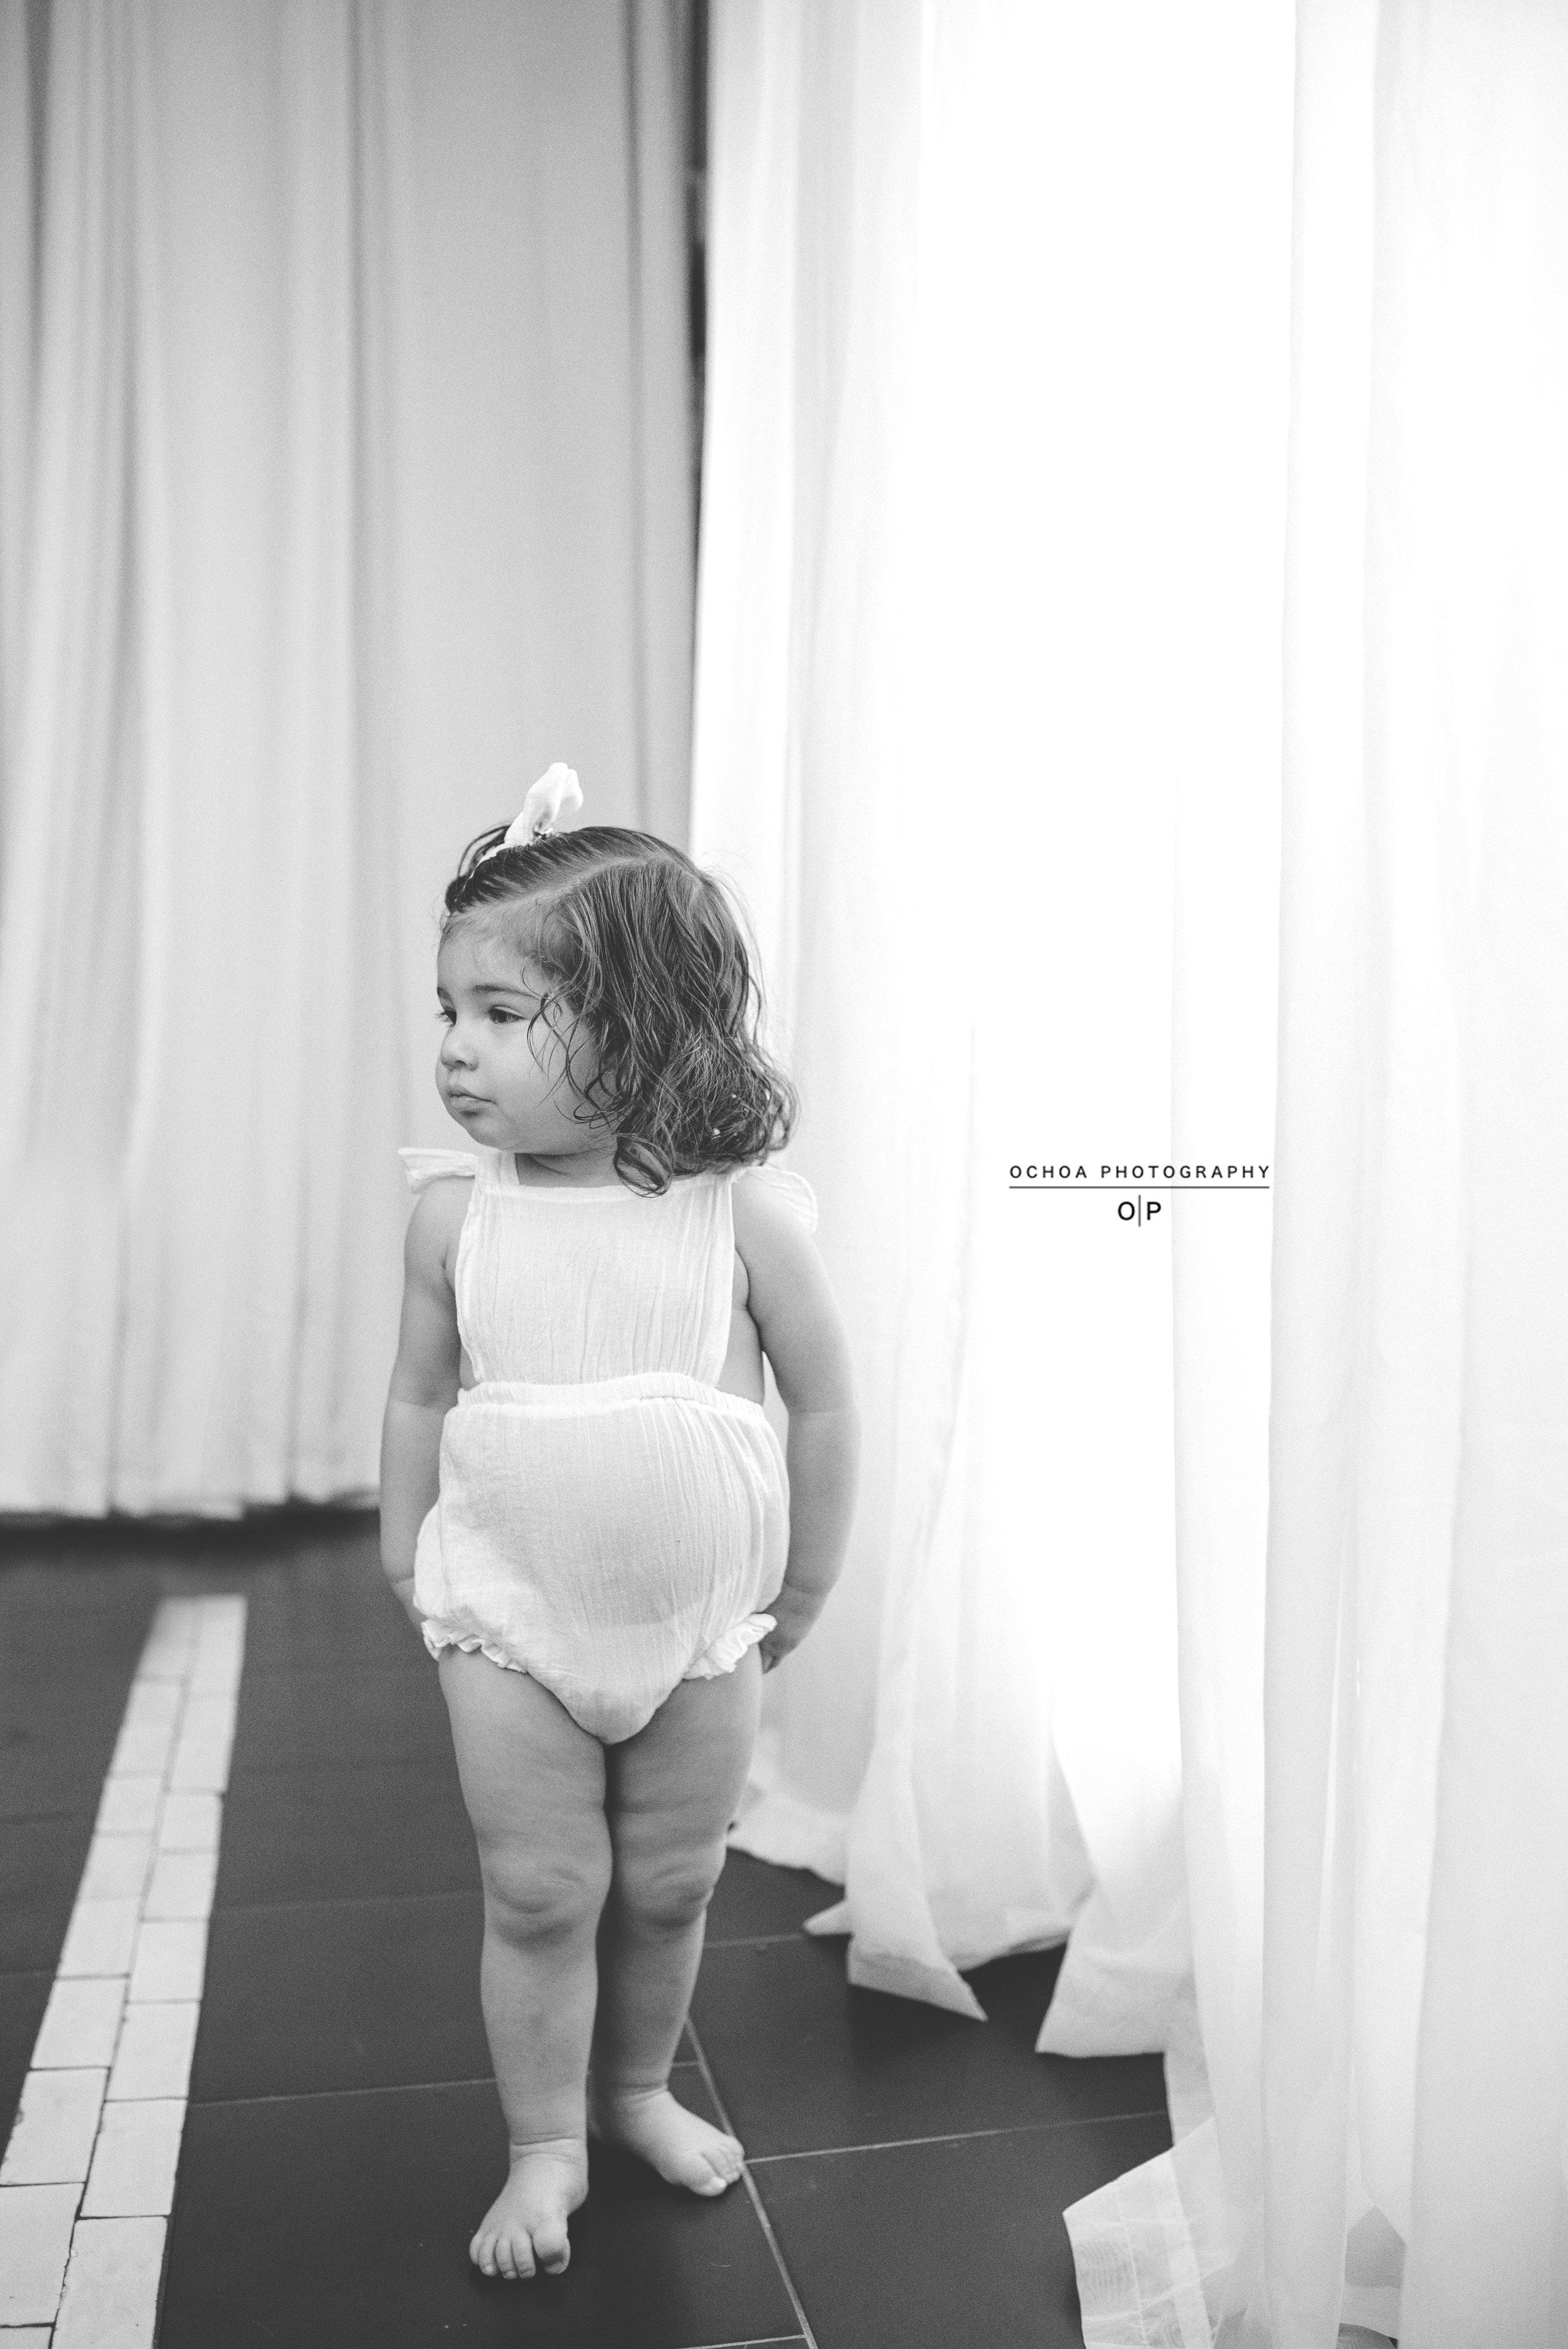 Ochoa Photography0030a.jpg